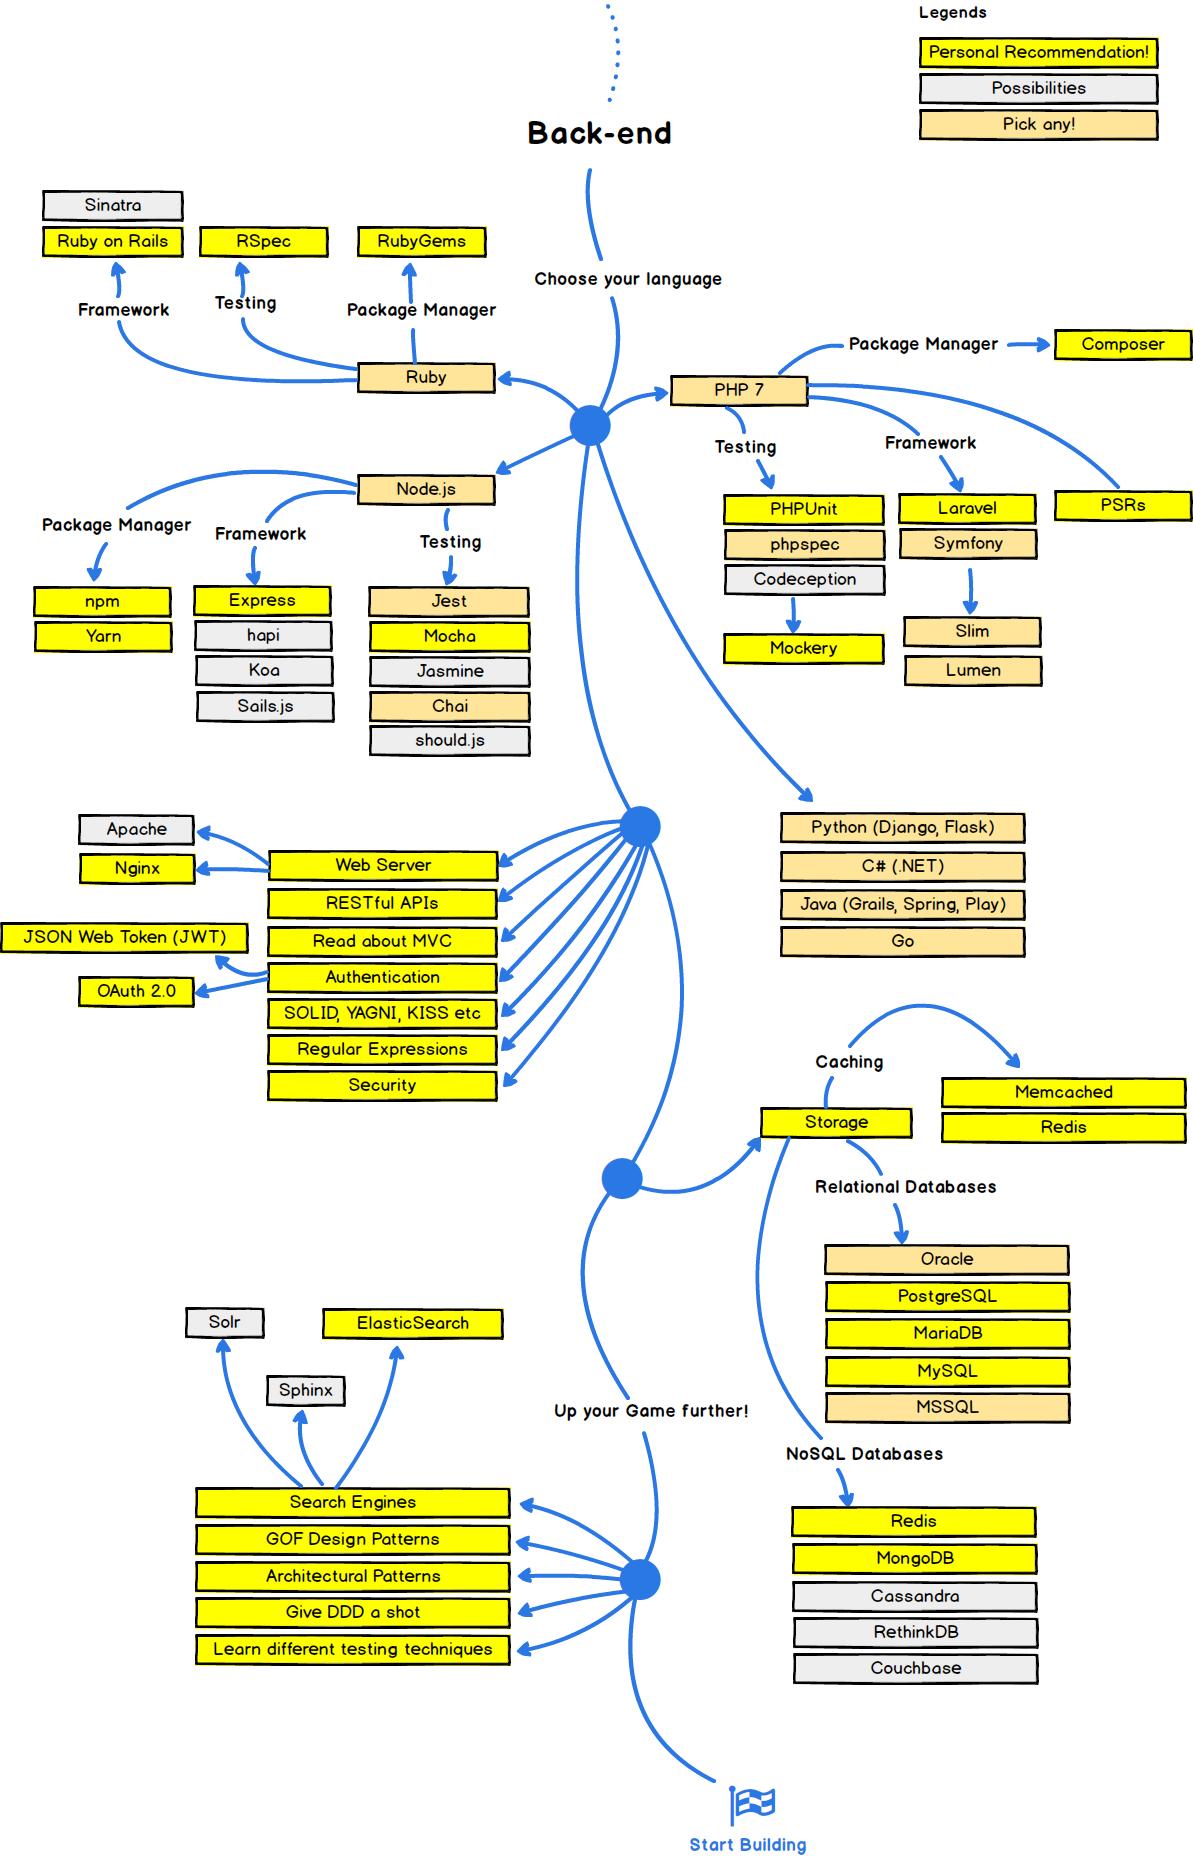 Kamranahmedse Developer Roadmap Roadmap To Becoming A Web Developer In 2017 Programing Knowledge Backend Developer Learn To Code